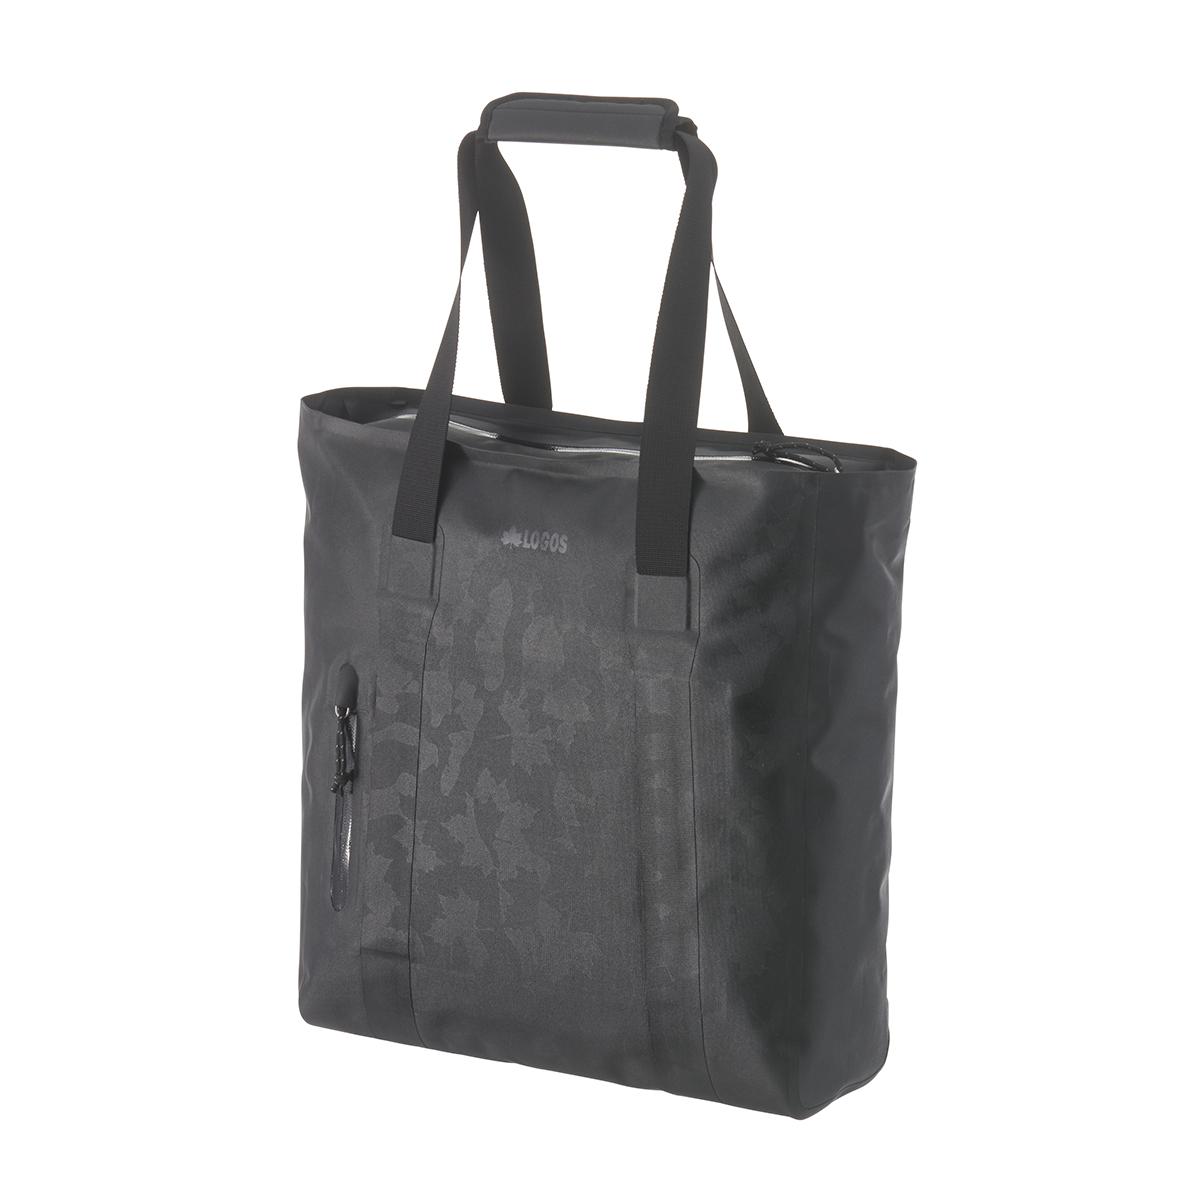 LOGOS ロゴス SPLASH mobi トートリュック(ブラックカモ) 88200126